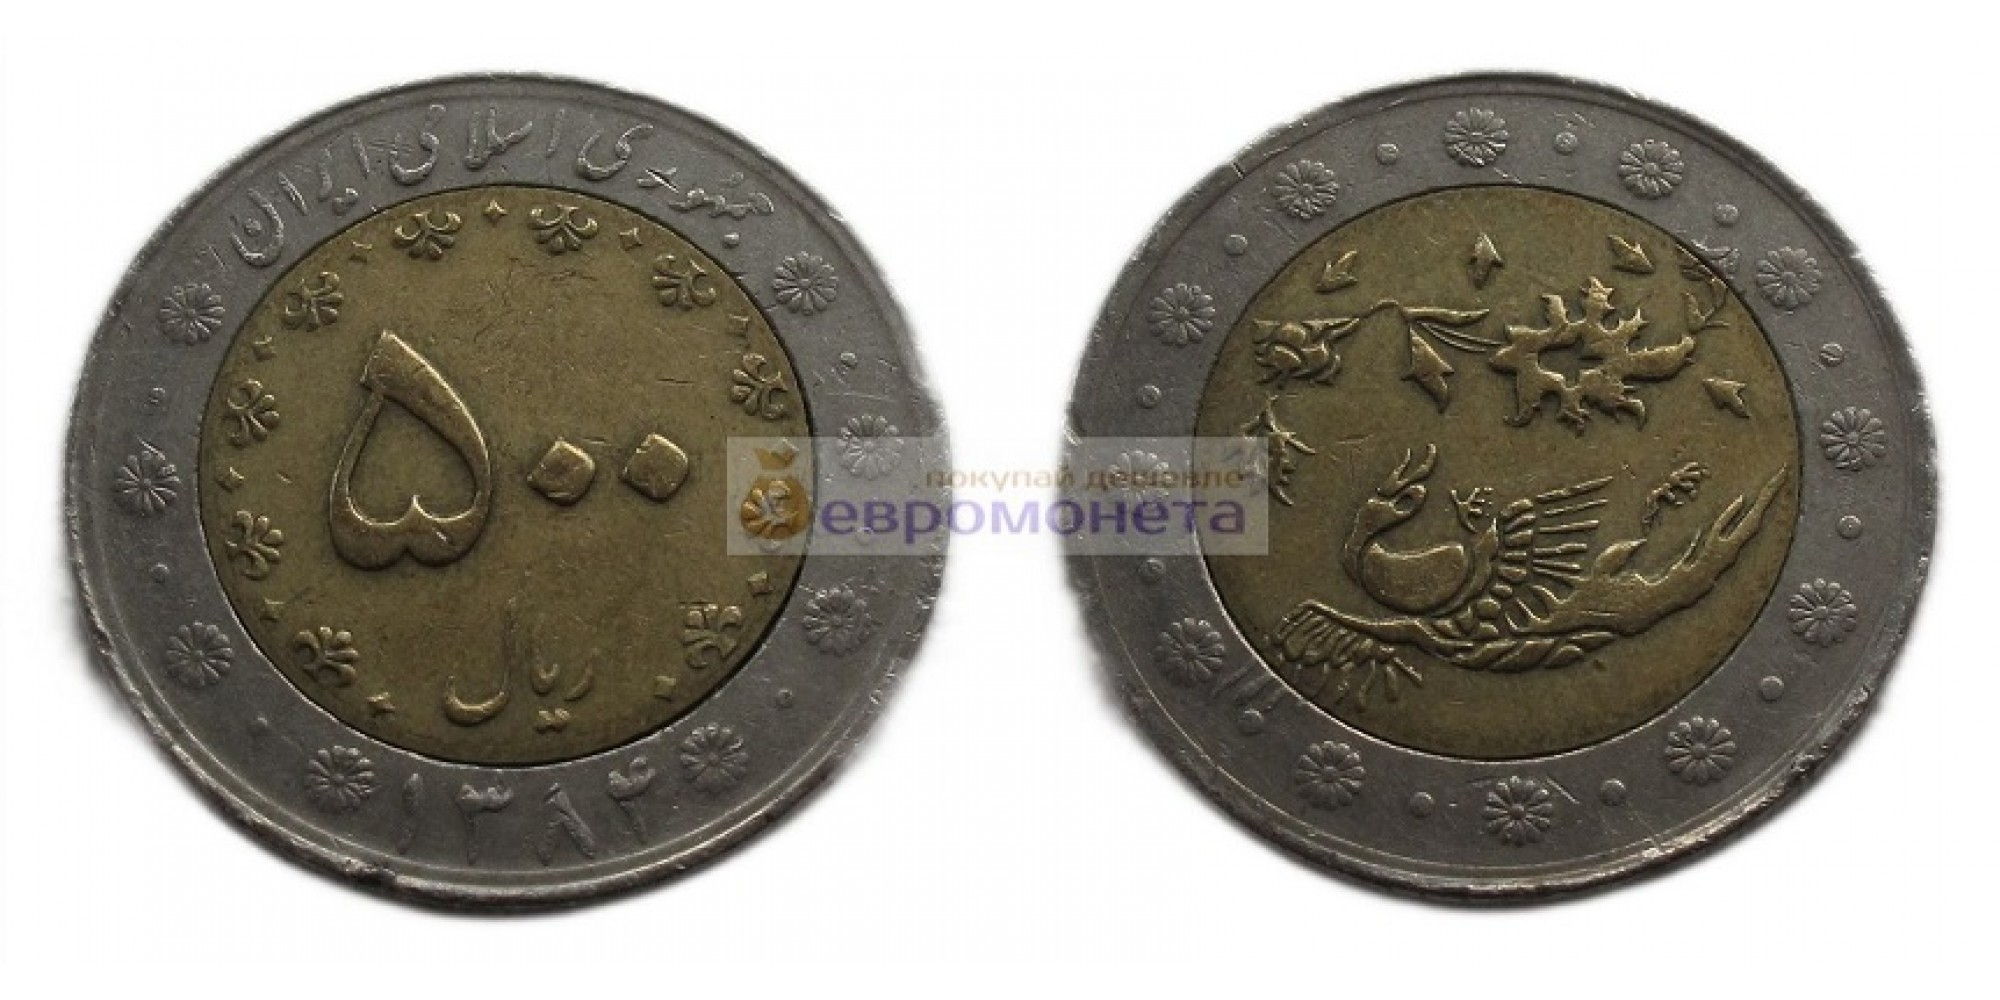 Иран 500 риалов 2004 год. Биметалл